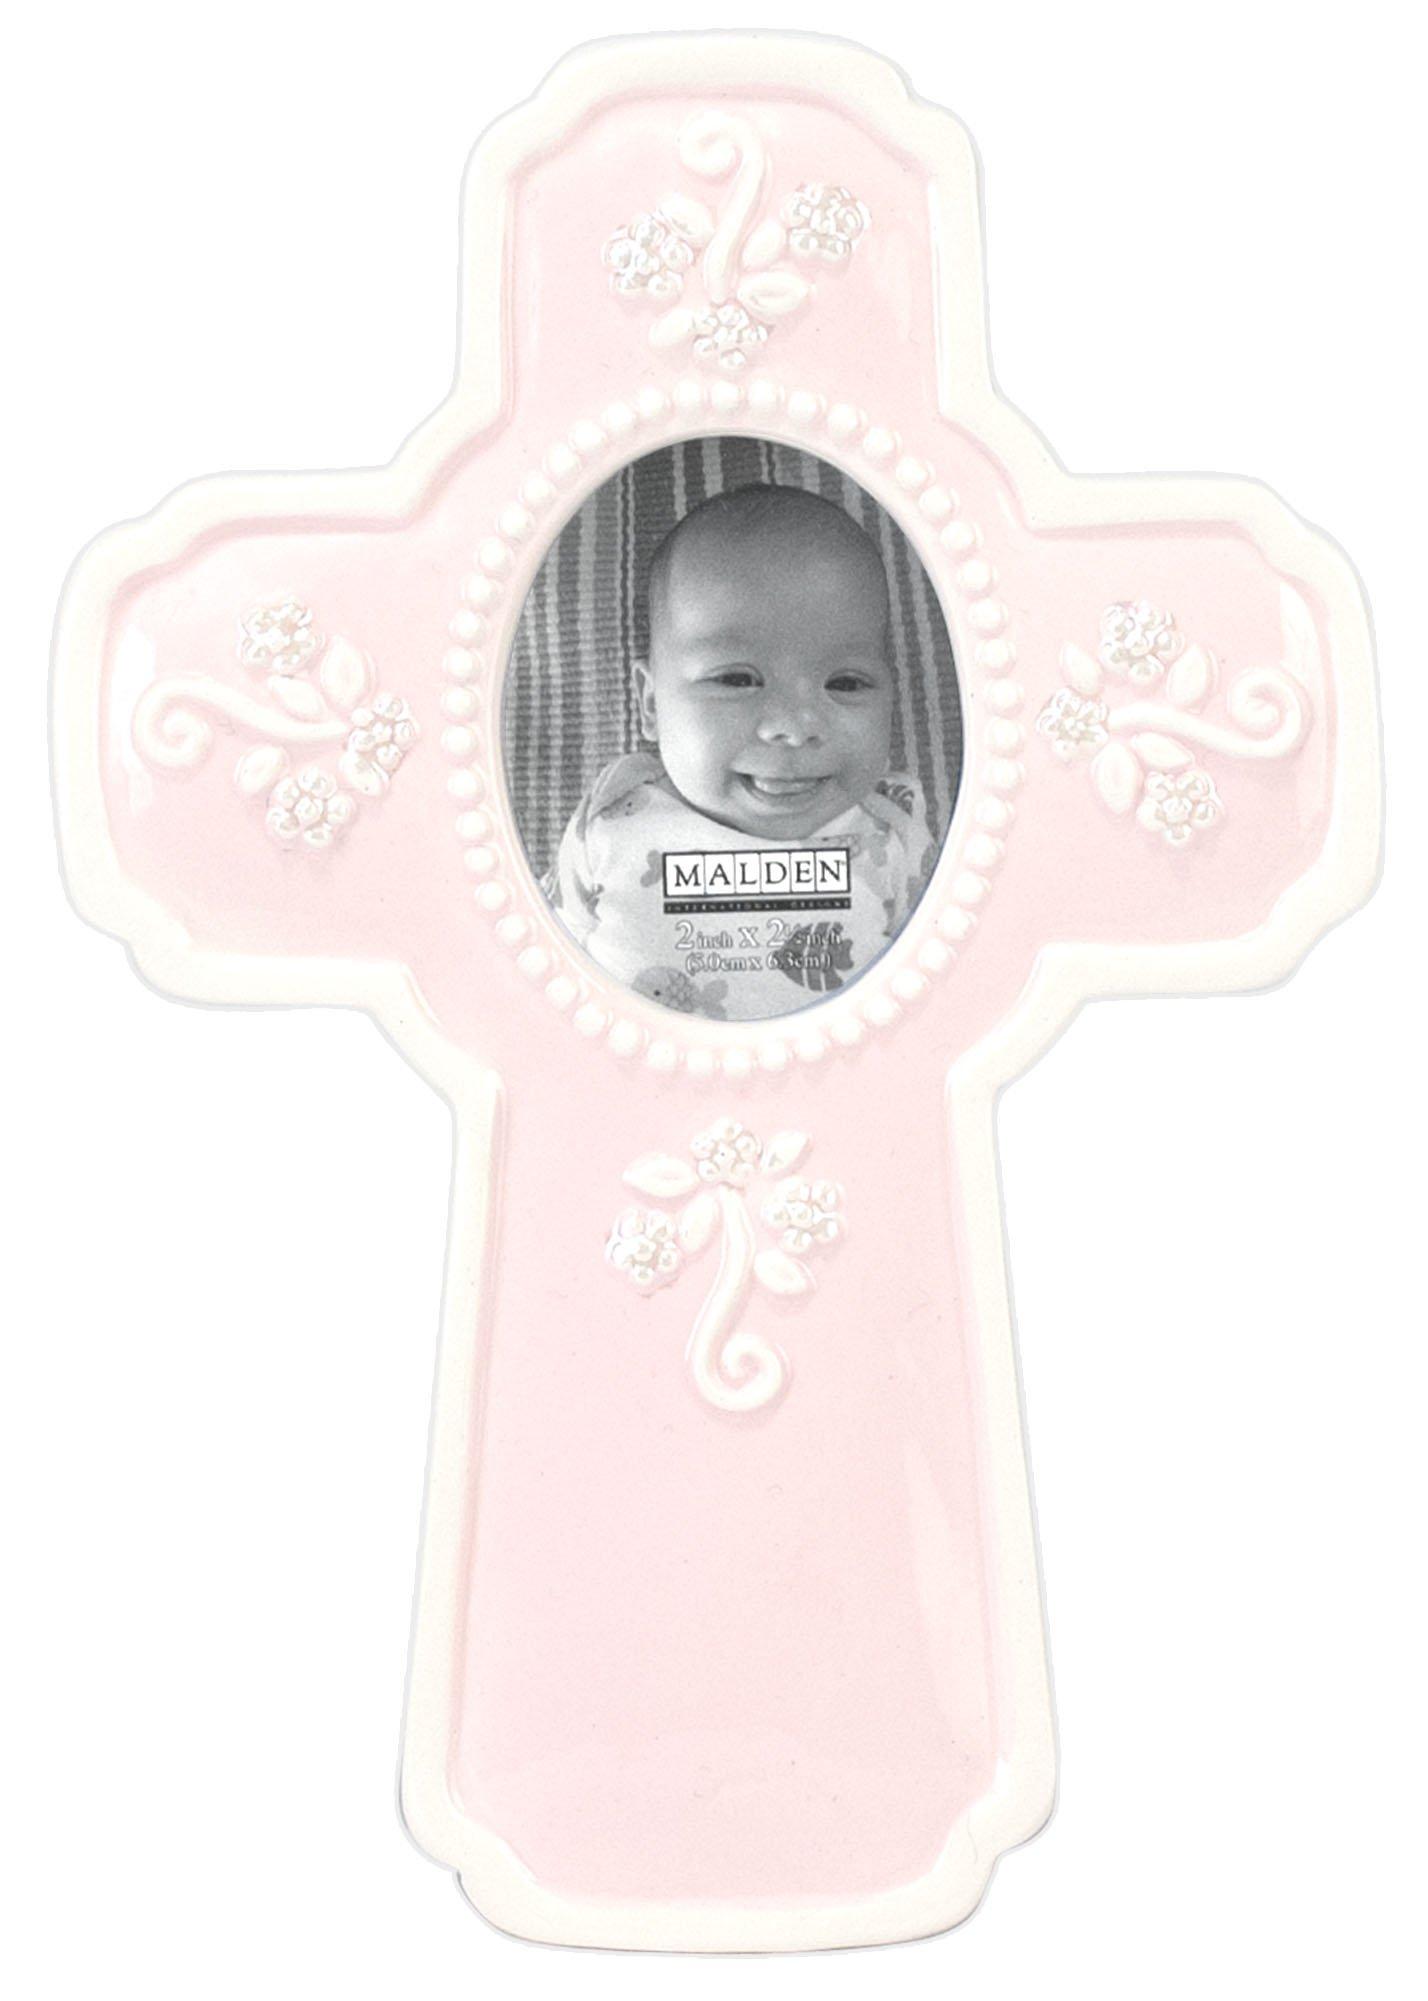 Malden International Designs Glazed Ceramic In a Cross Picture Frame, 2x2, Pink